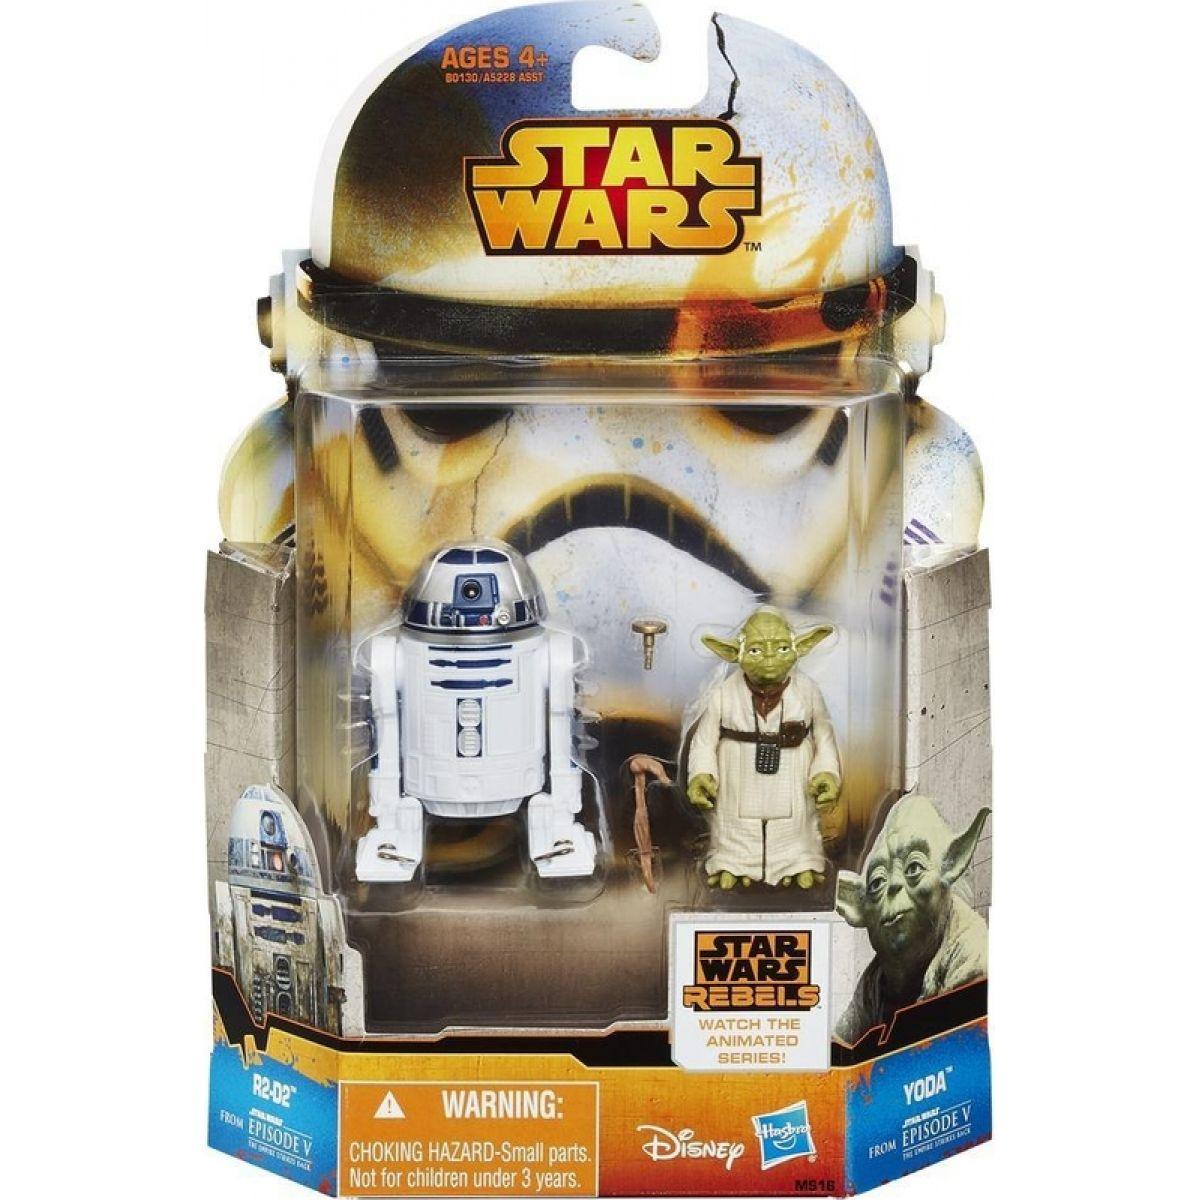 Star Wars akční figurky 2ks Hasbro A5228 - R2-D2 a Yoda #2